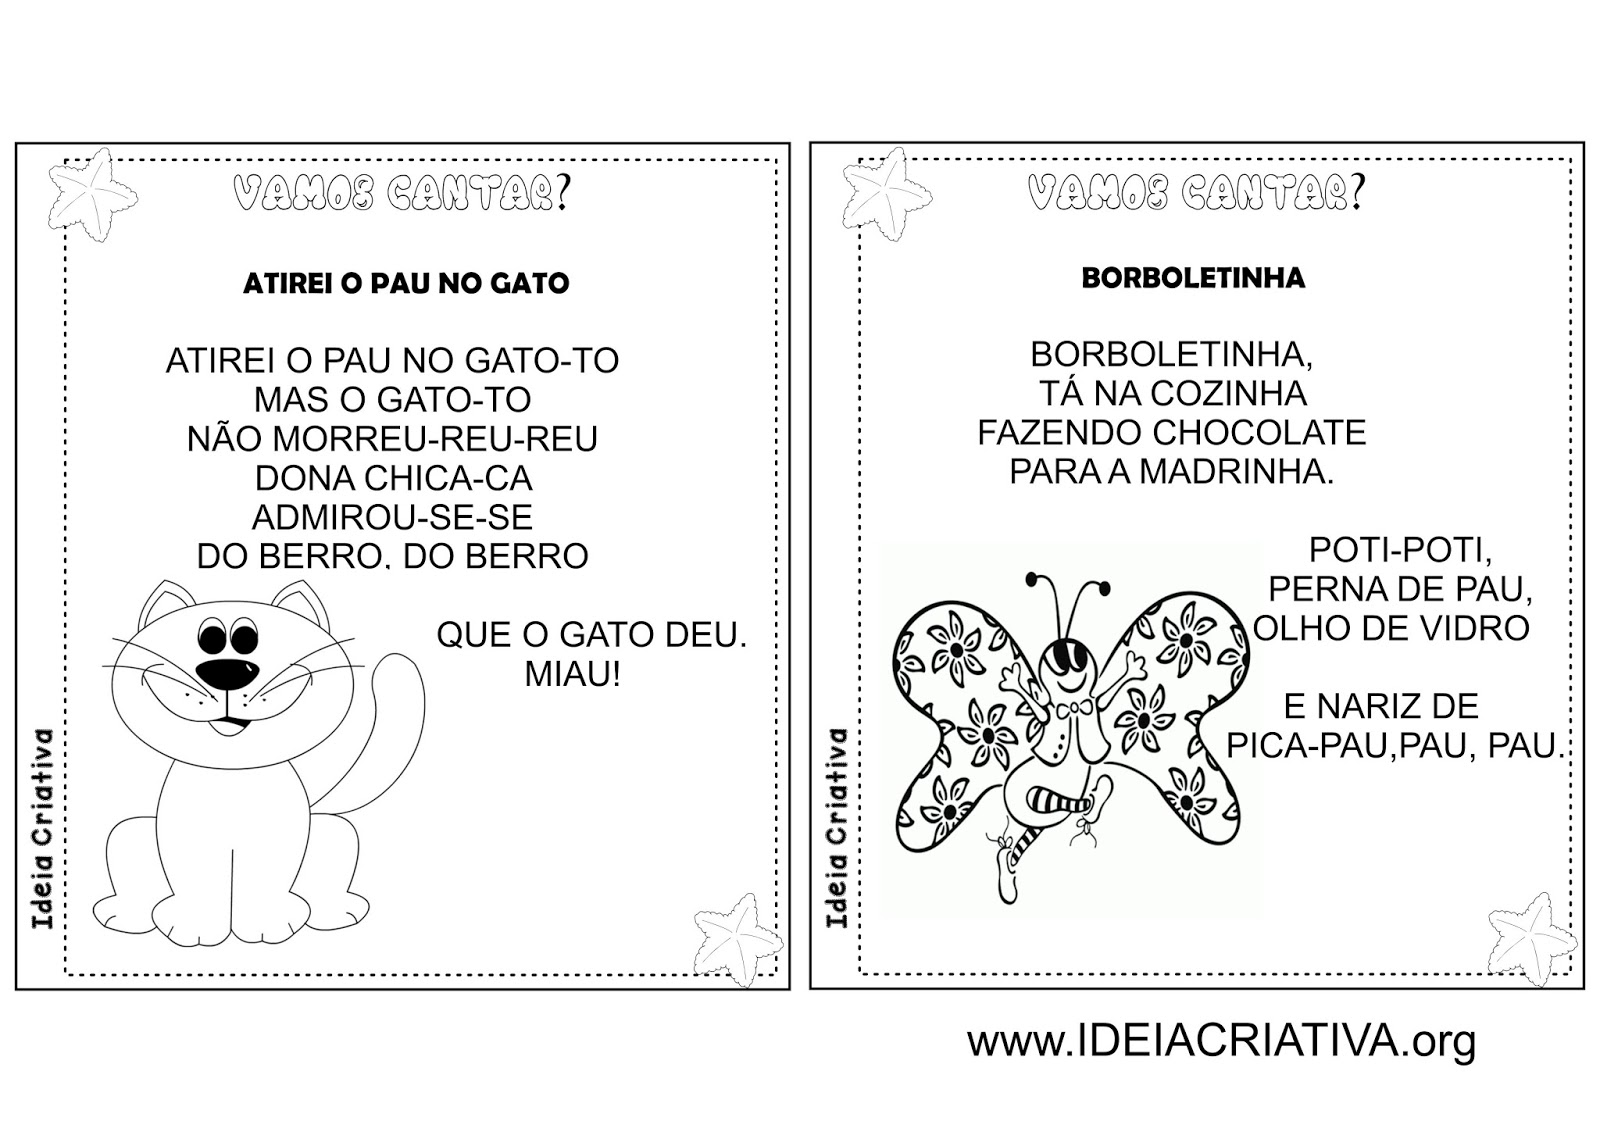 Preferência Álbum Ilustrado Cantigas de Roda Folclore | Ideia Criativa - Gi  RC78